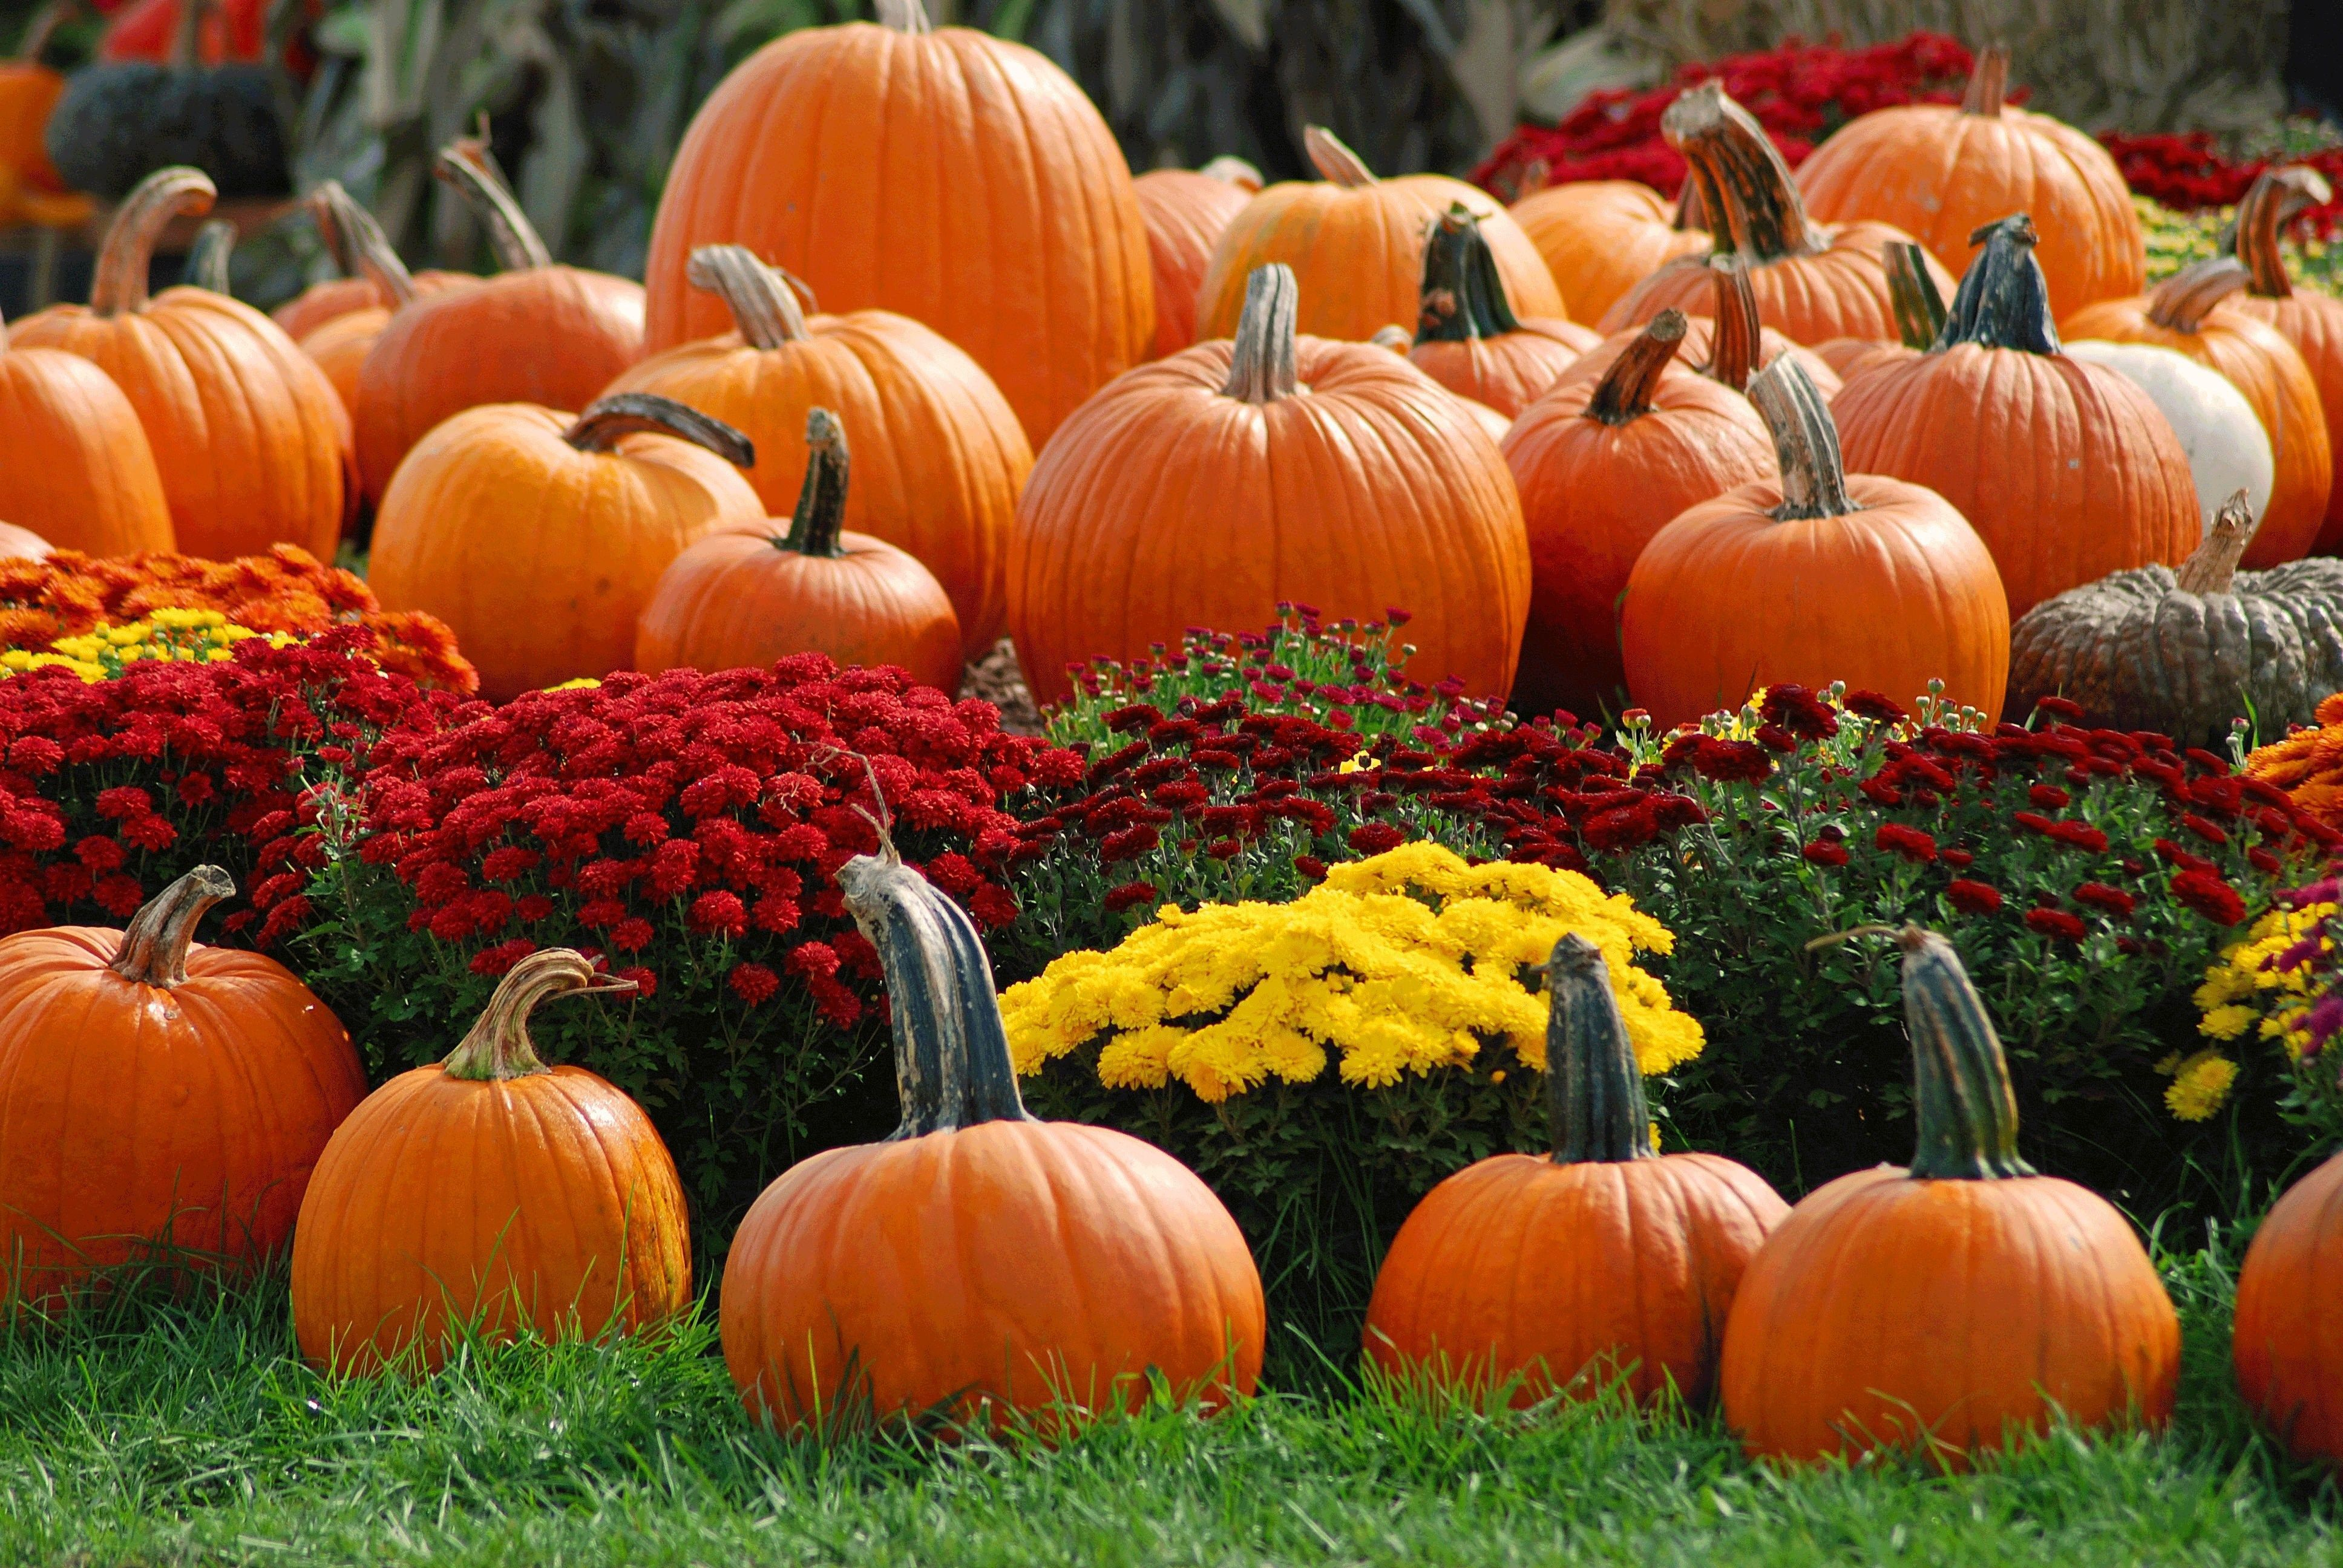 30 Fall Mums and Pumpkins Wallpapers   Download at WallpaperBro 3872x2592